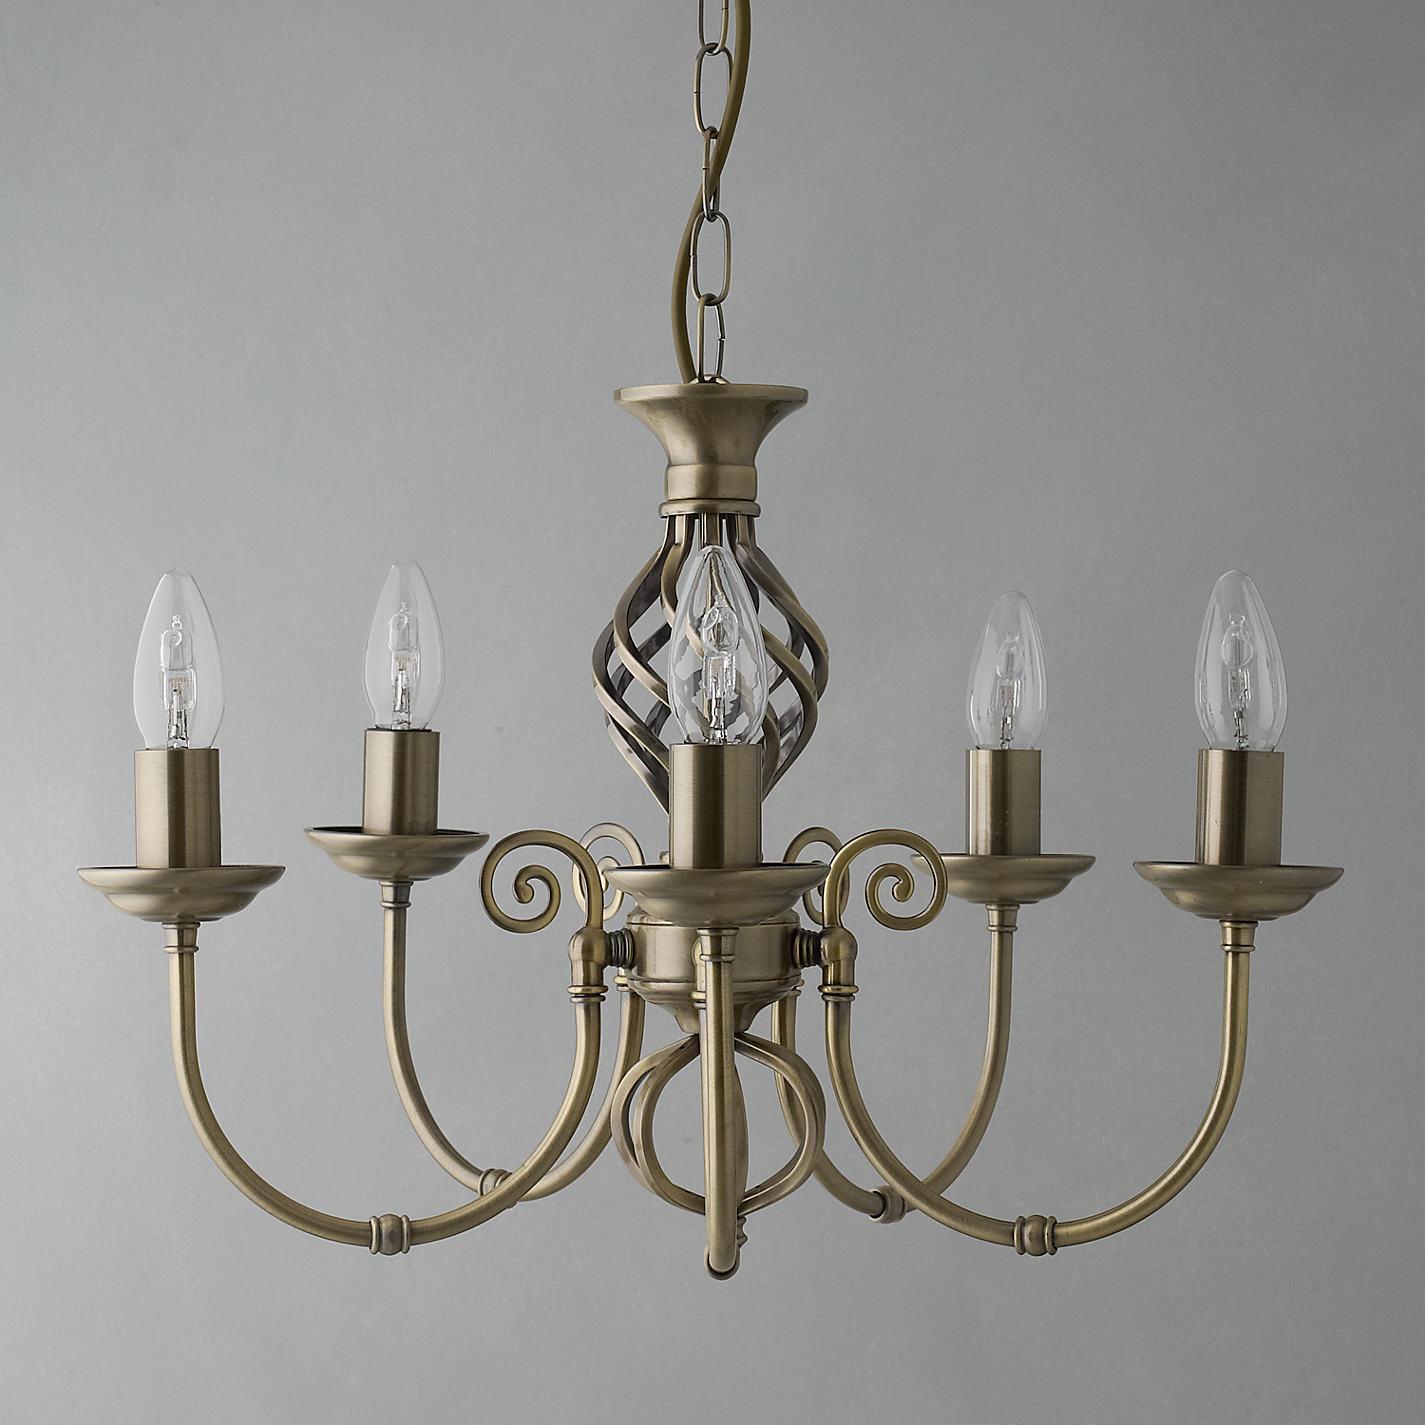 Buy john lewis malik chandelier 5 arm john lewis buy john lewis malik chandelier 5 arm online at johnlewis aloadofball Gallery